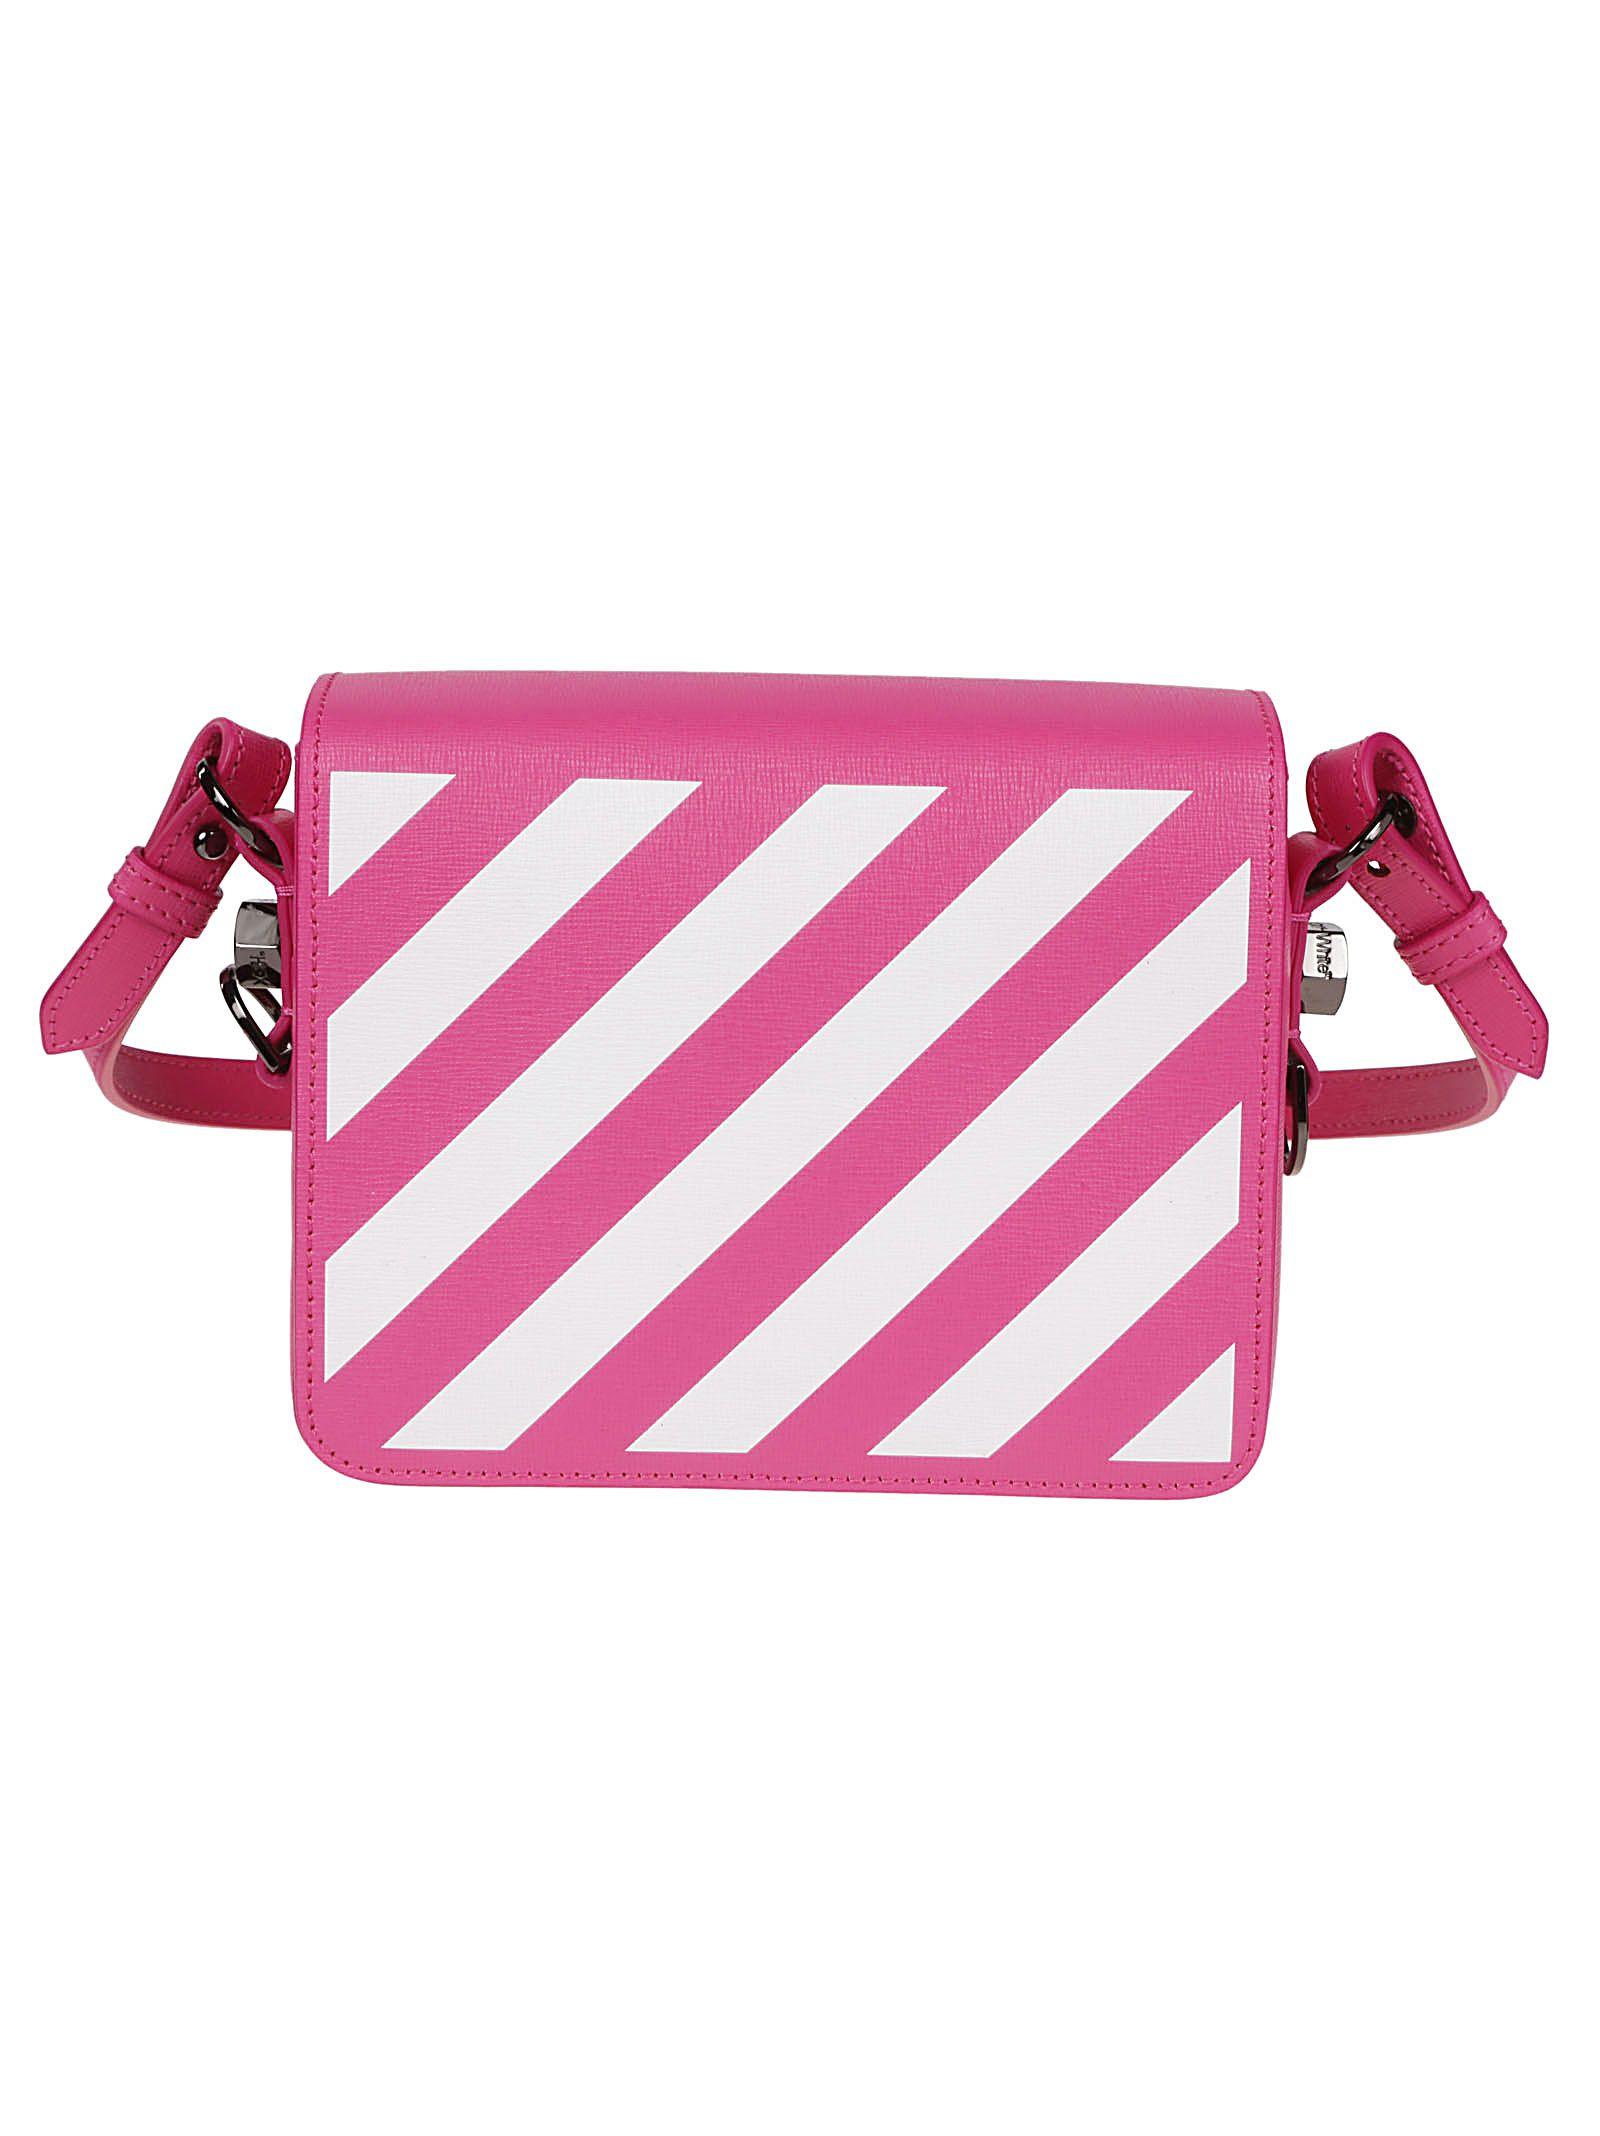 34ab82919a Off-White Off-white Striped Shoulder Bag - Basic - 10805283